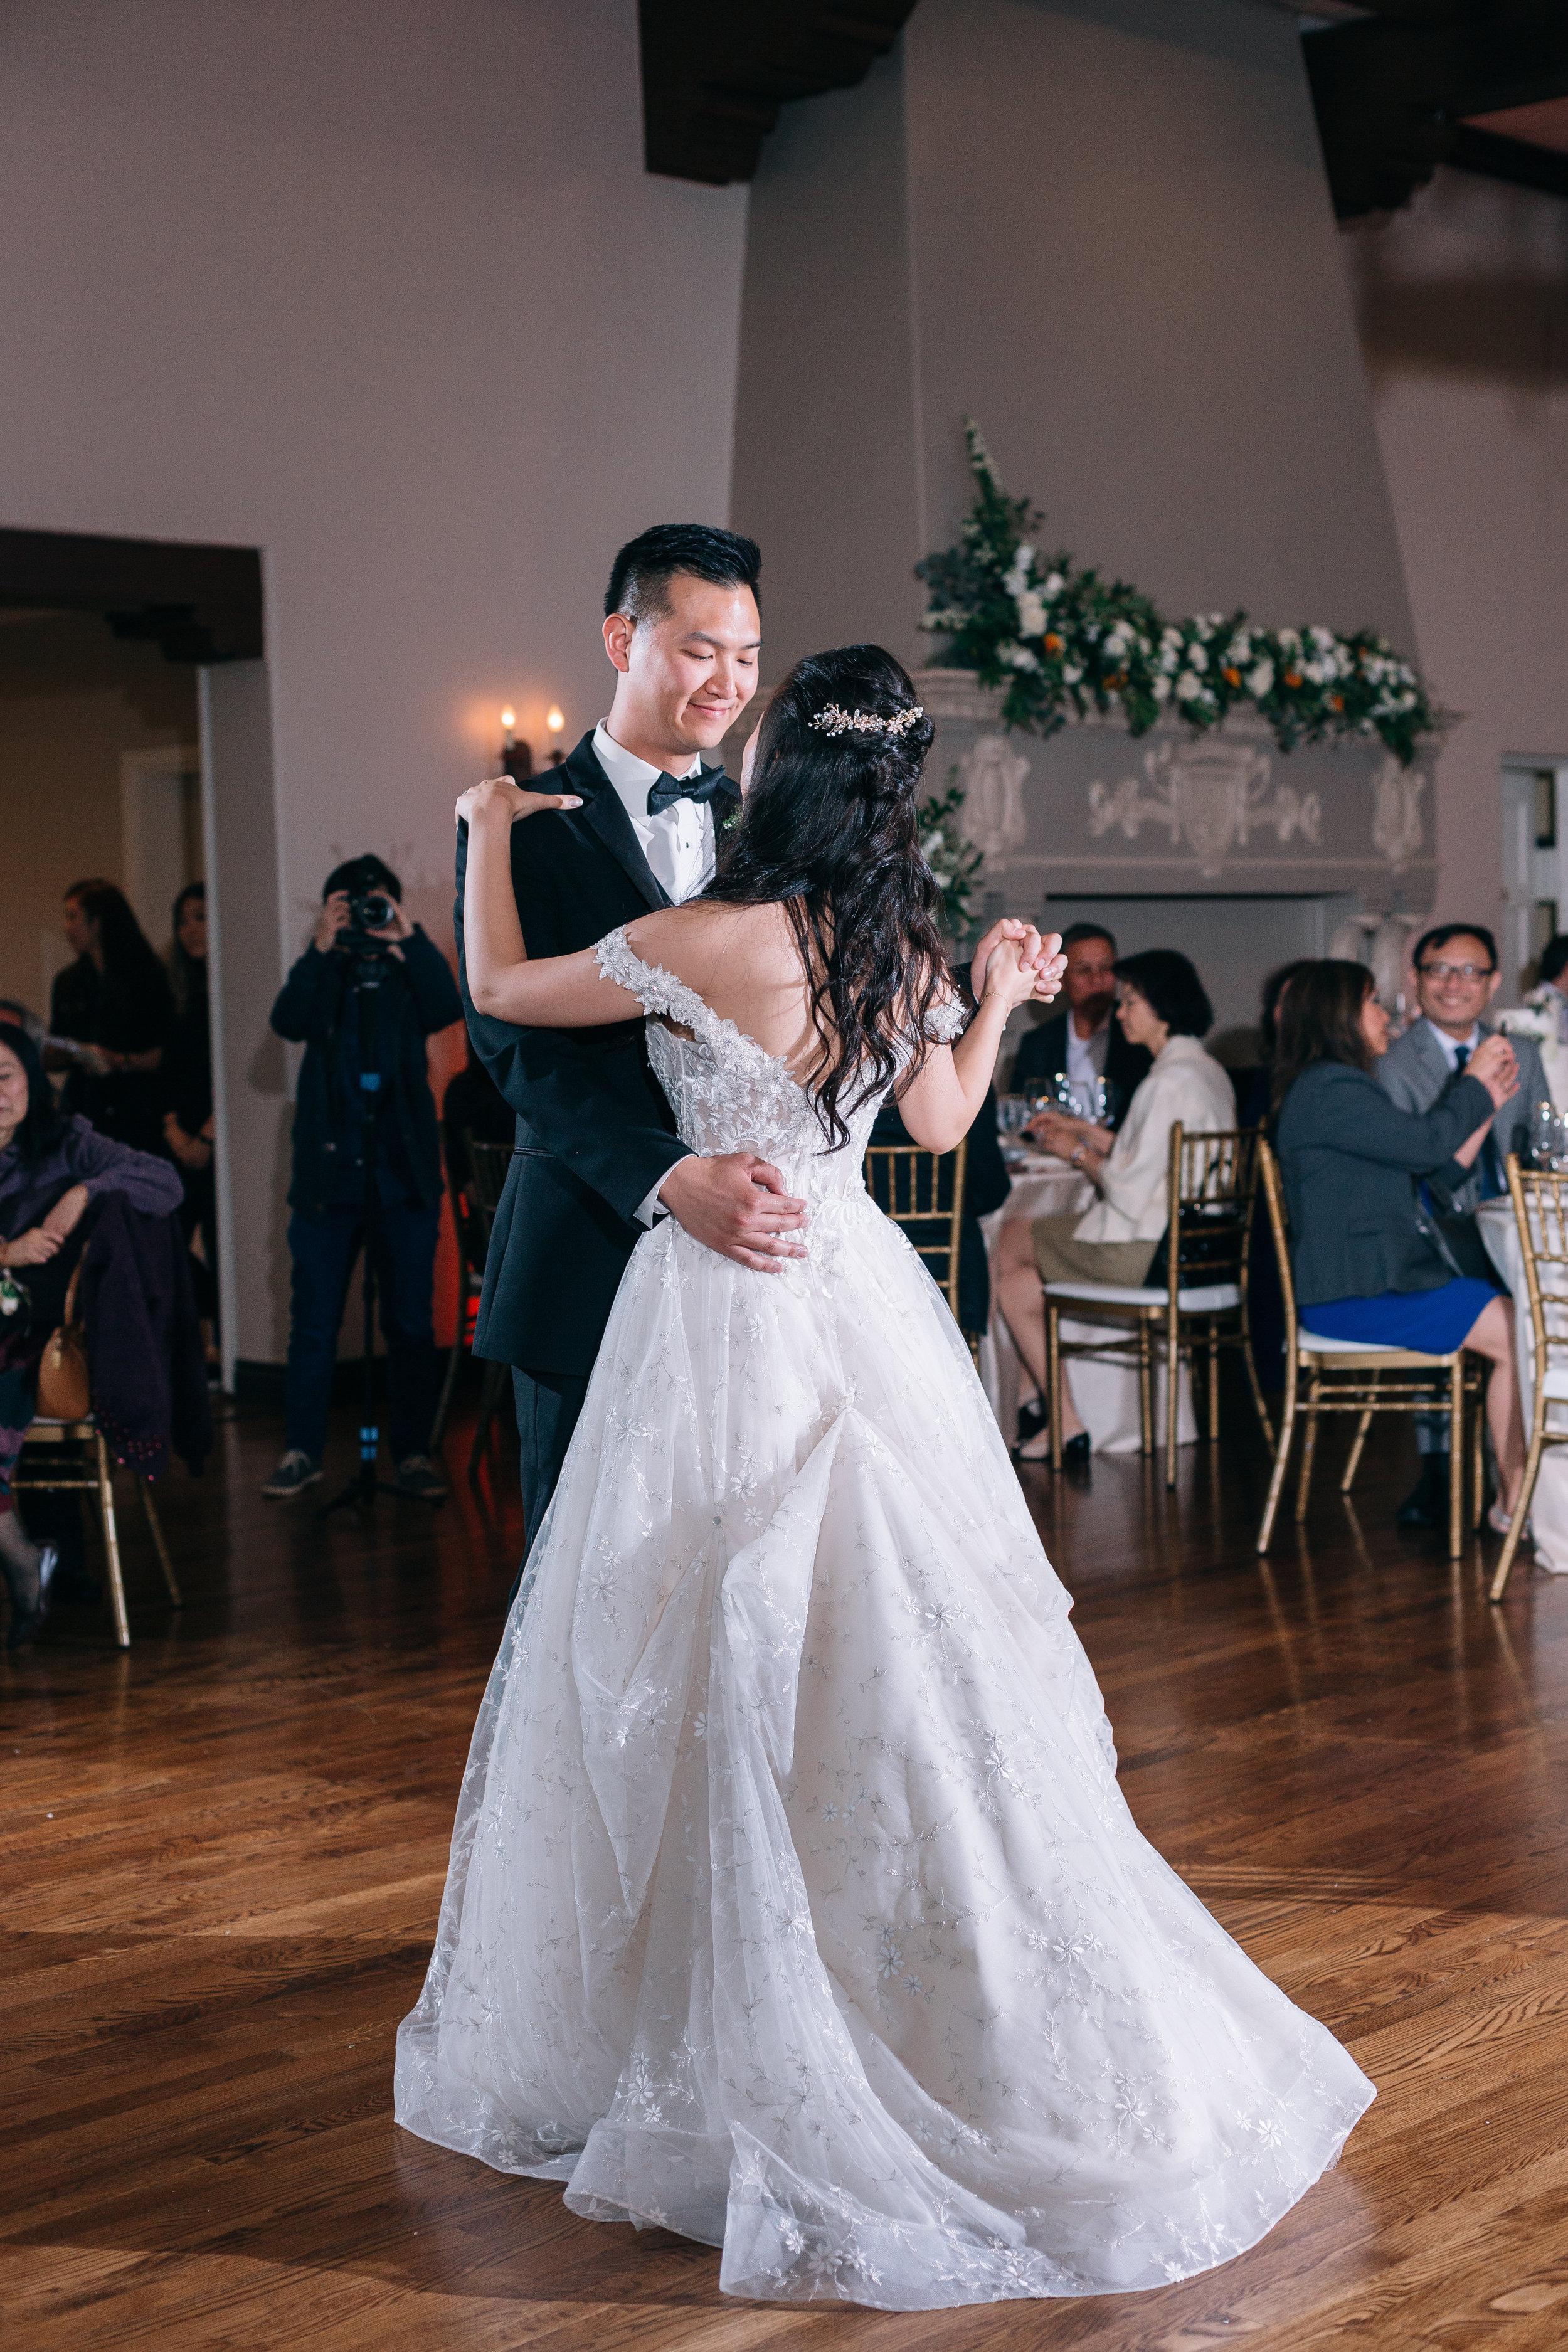 weddingaltadenatowncountryclubrachelallenreception-9.jpg